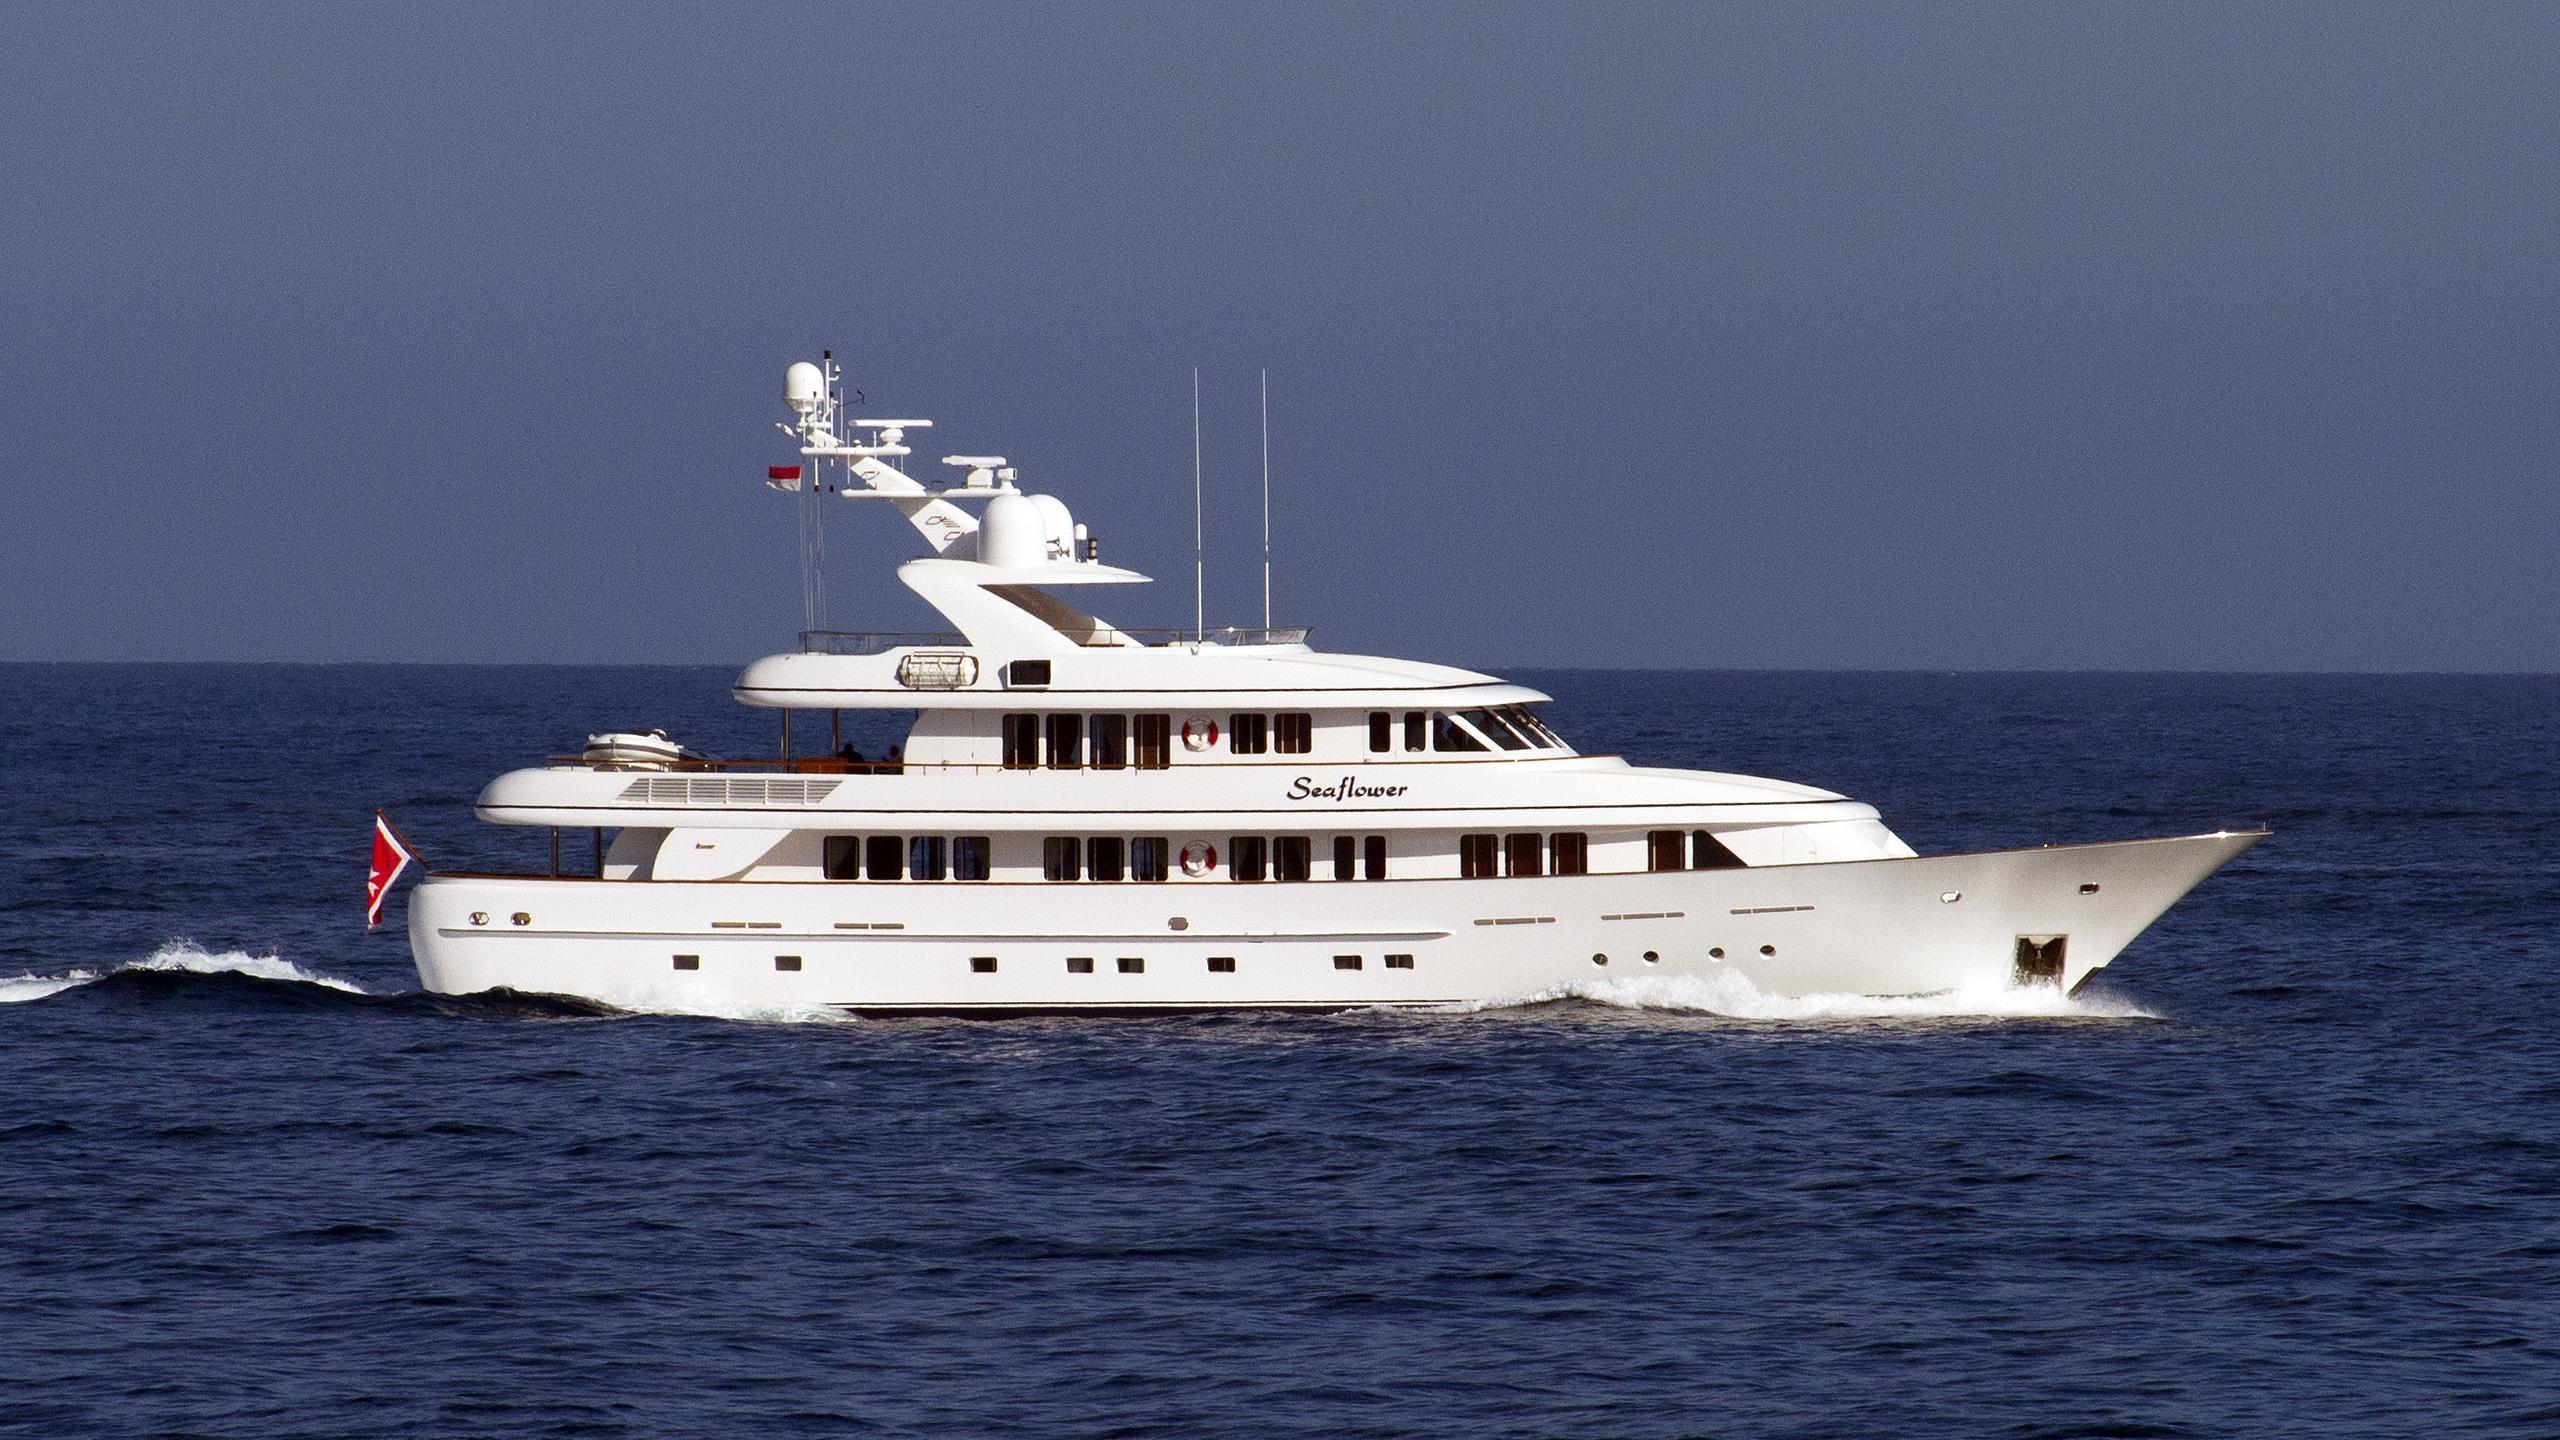 cipitouba-seaflower-motor-yacht-feadship-2002-40m-cruising-profile